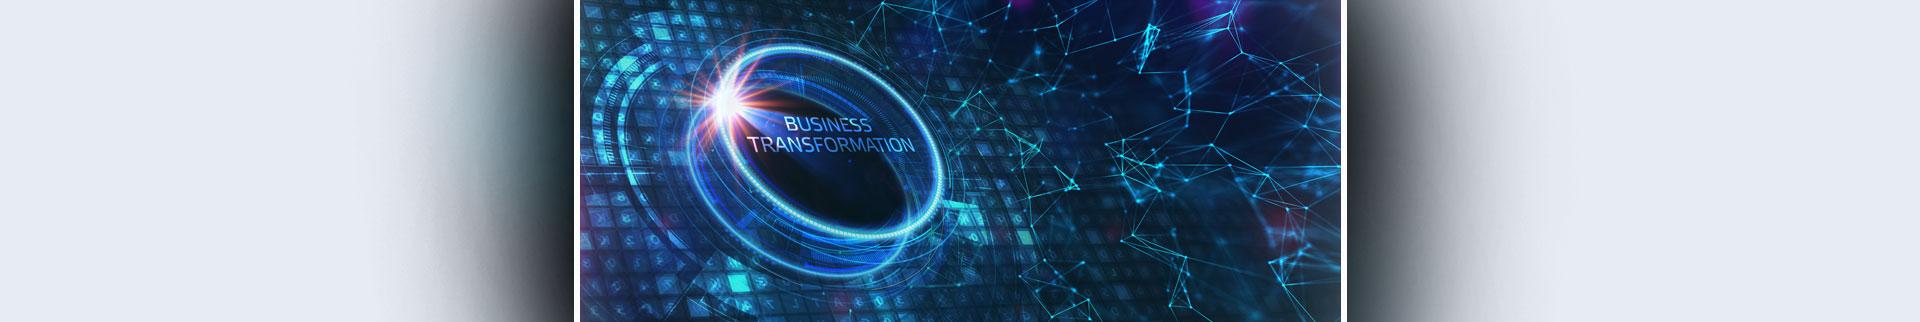 CIOs digital transformation